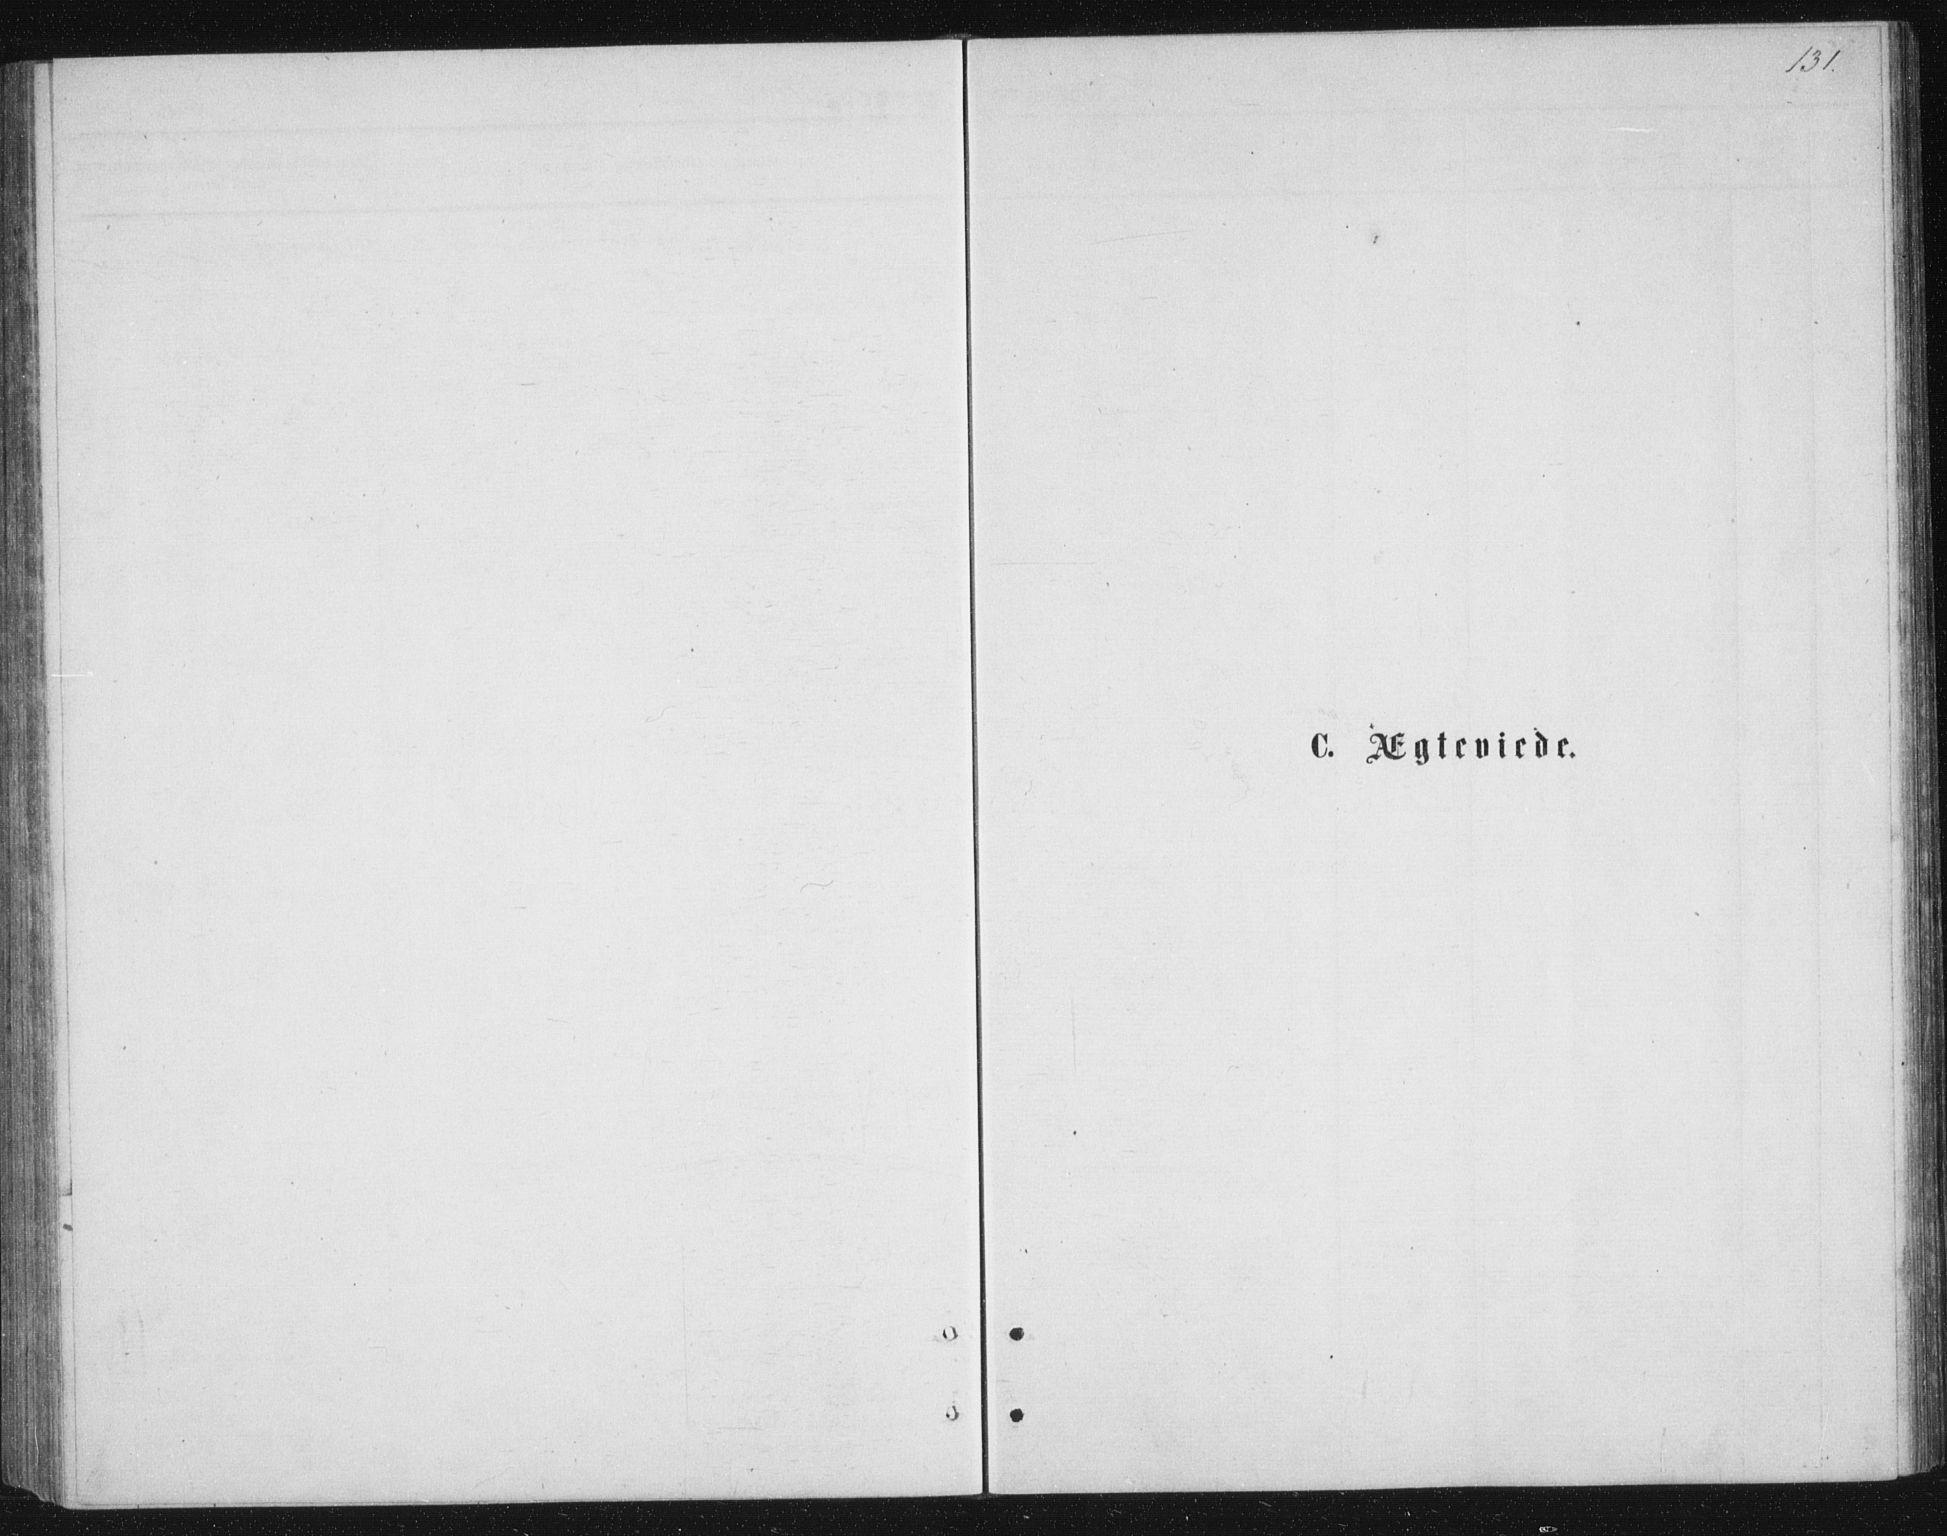 SATØ, Tranøy sokneprestkontor, I/Ia/Iab/L0013klokker: Klokkerbok nr. 13, 1874-1896, s. 131